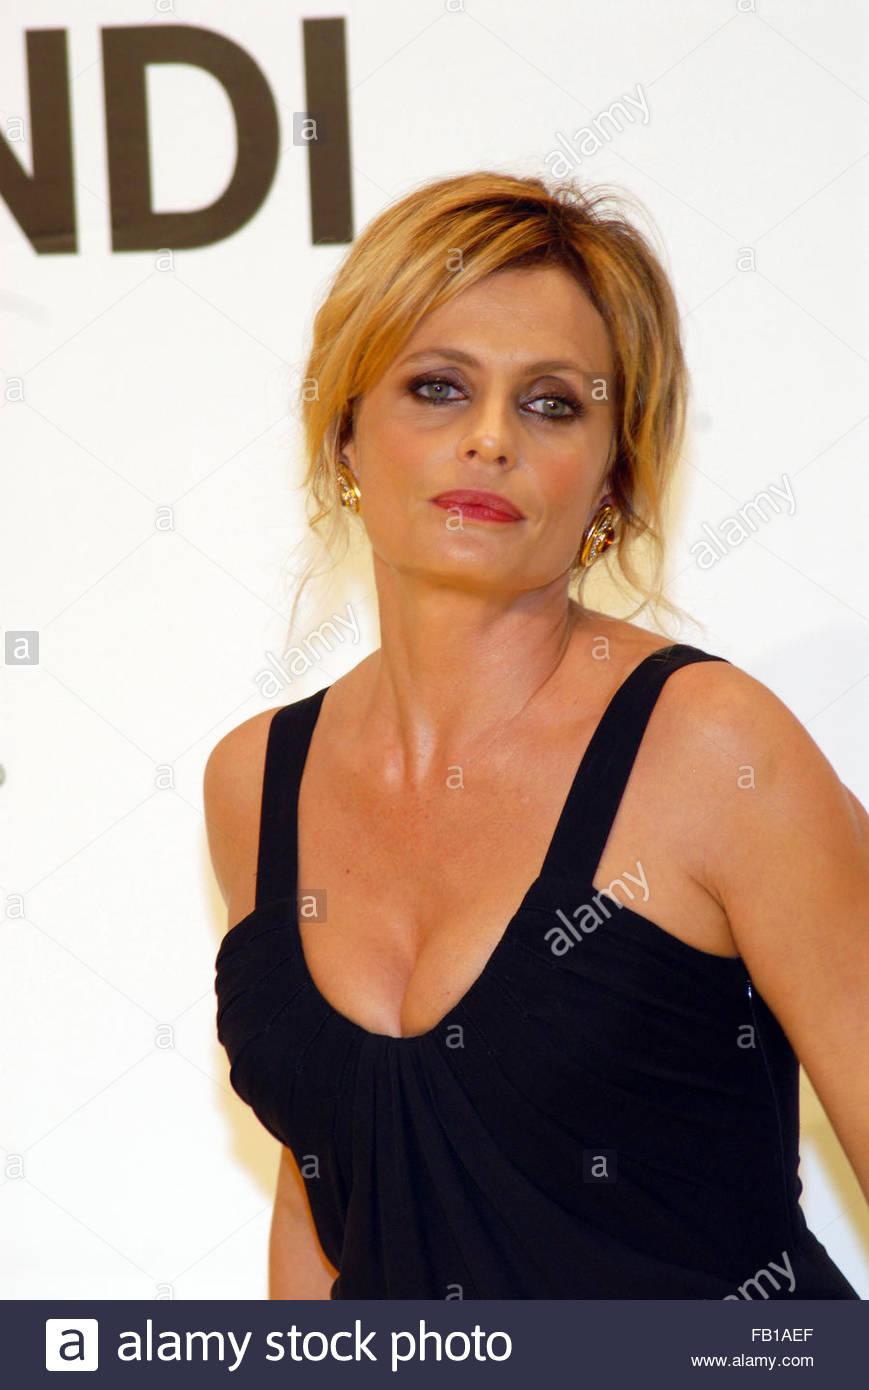 Forum on this topic: Angela Lanza (actress), isabella-ferrari/